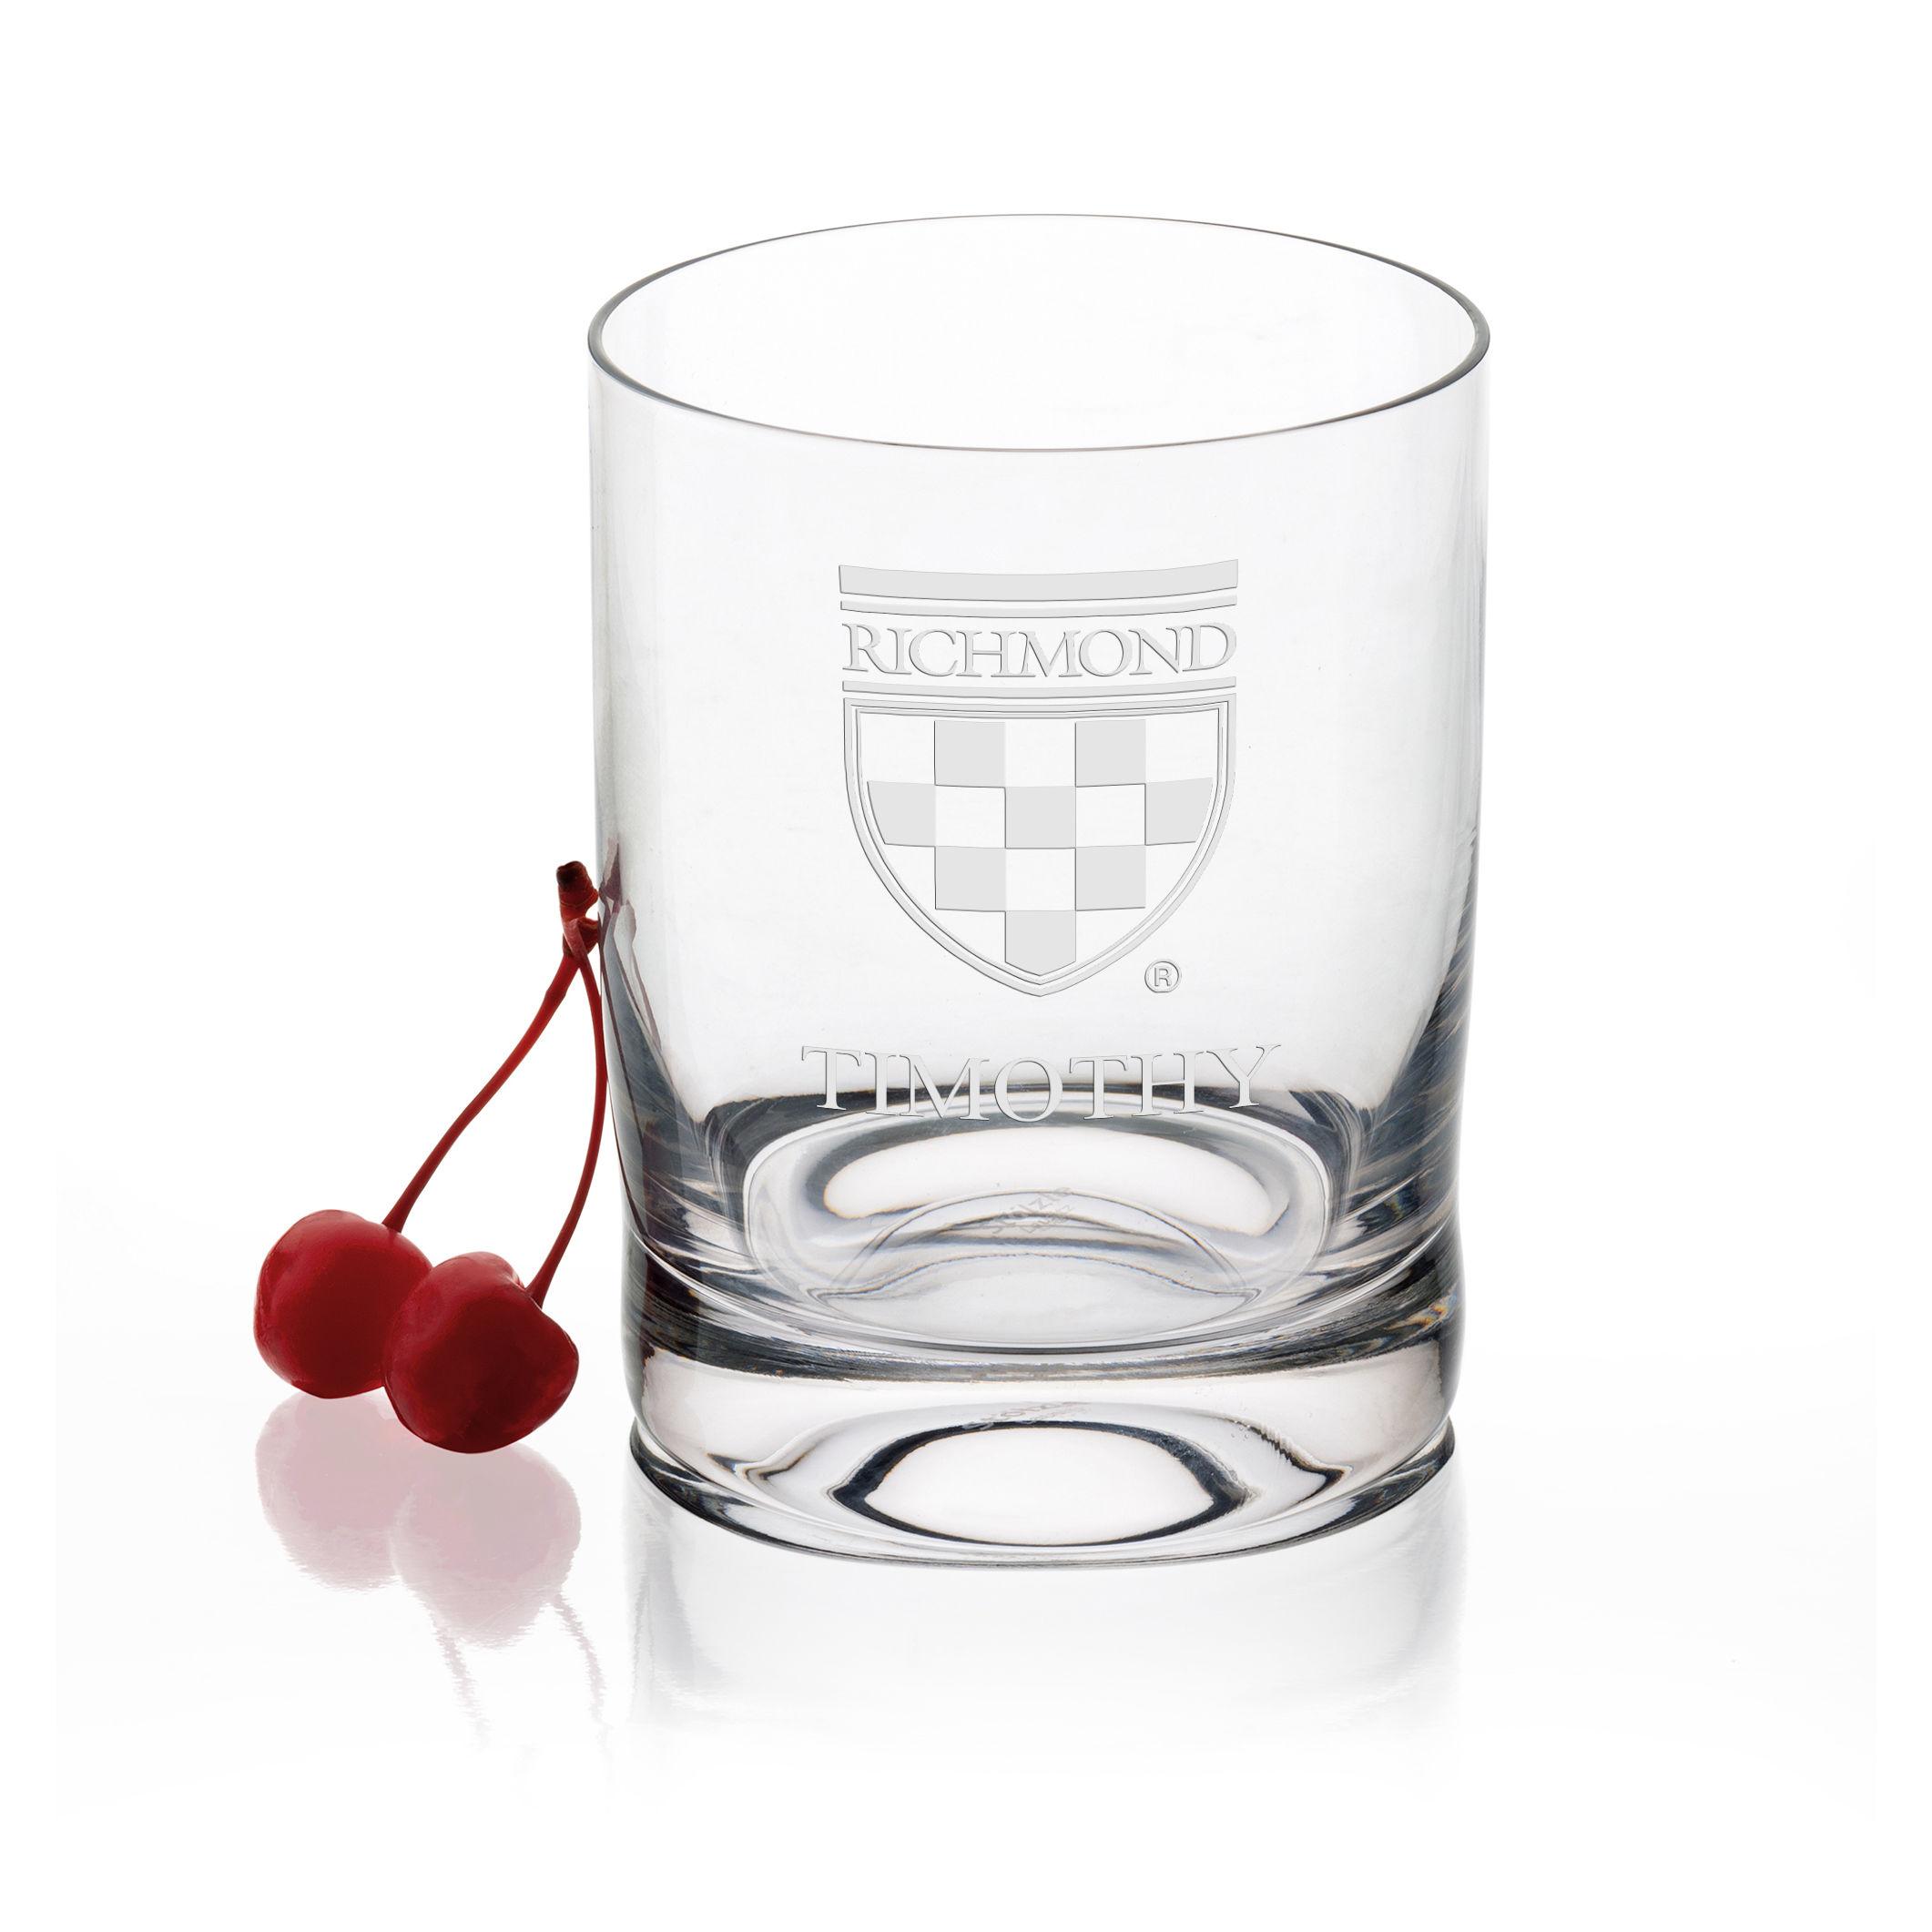 University of Richmond Tumbler Glasses - Set of 2